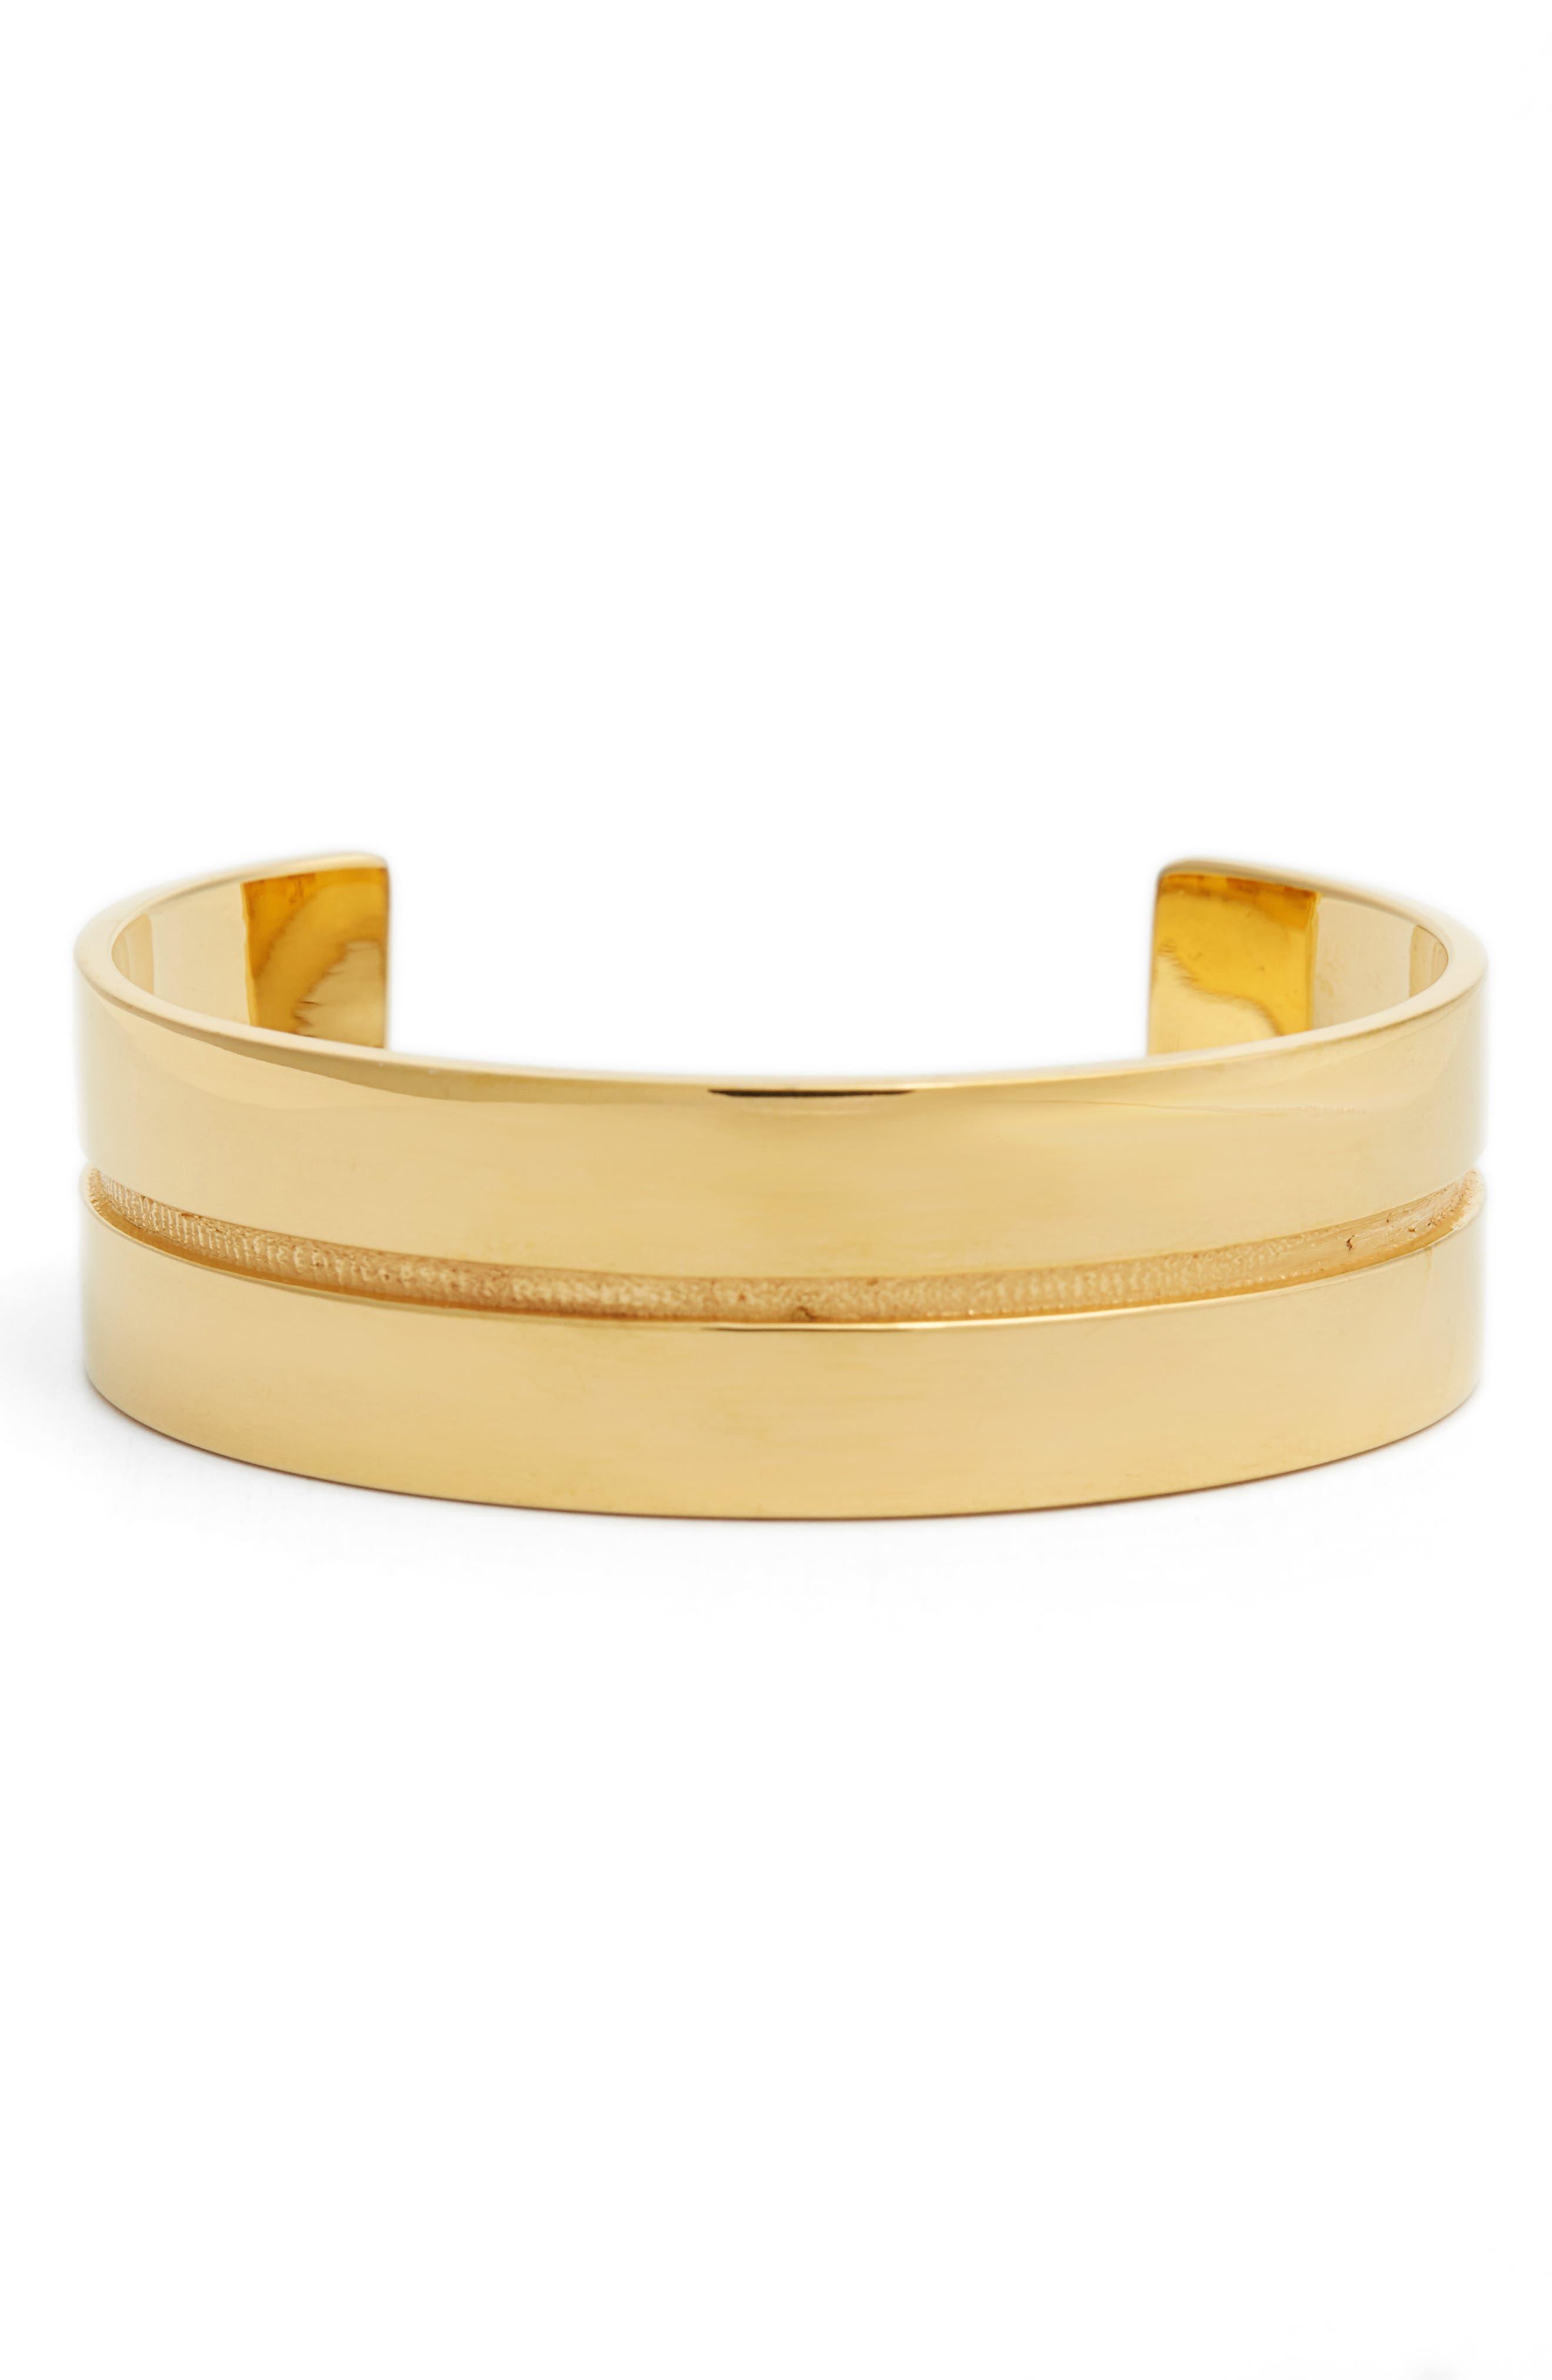 Sophie Buhai Mapplethorpe 2 Vermeil Cuff Bracelet